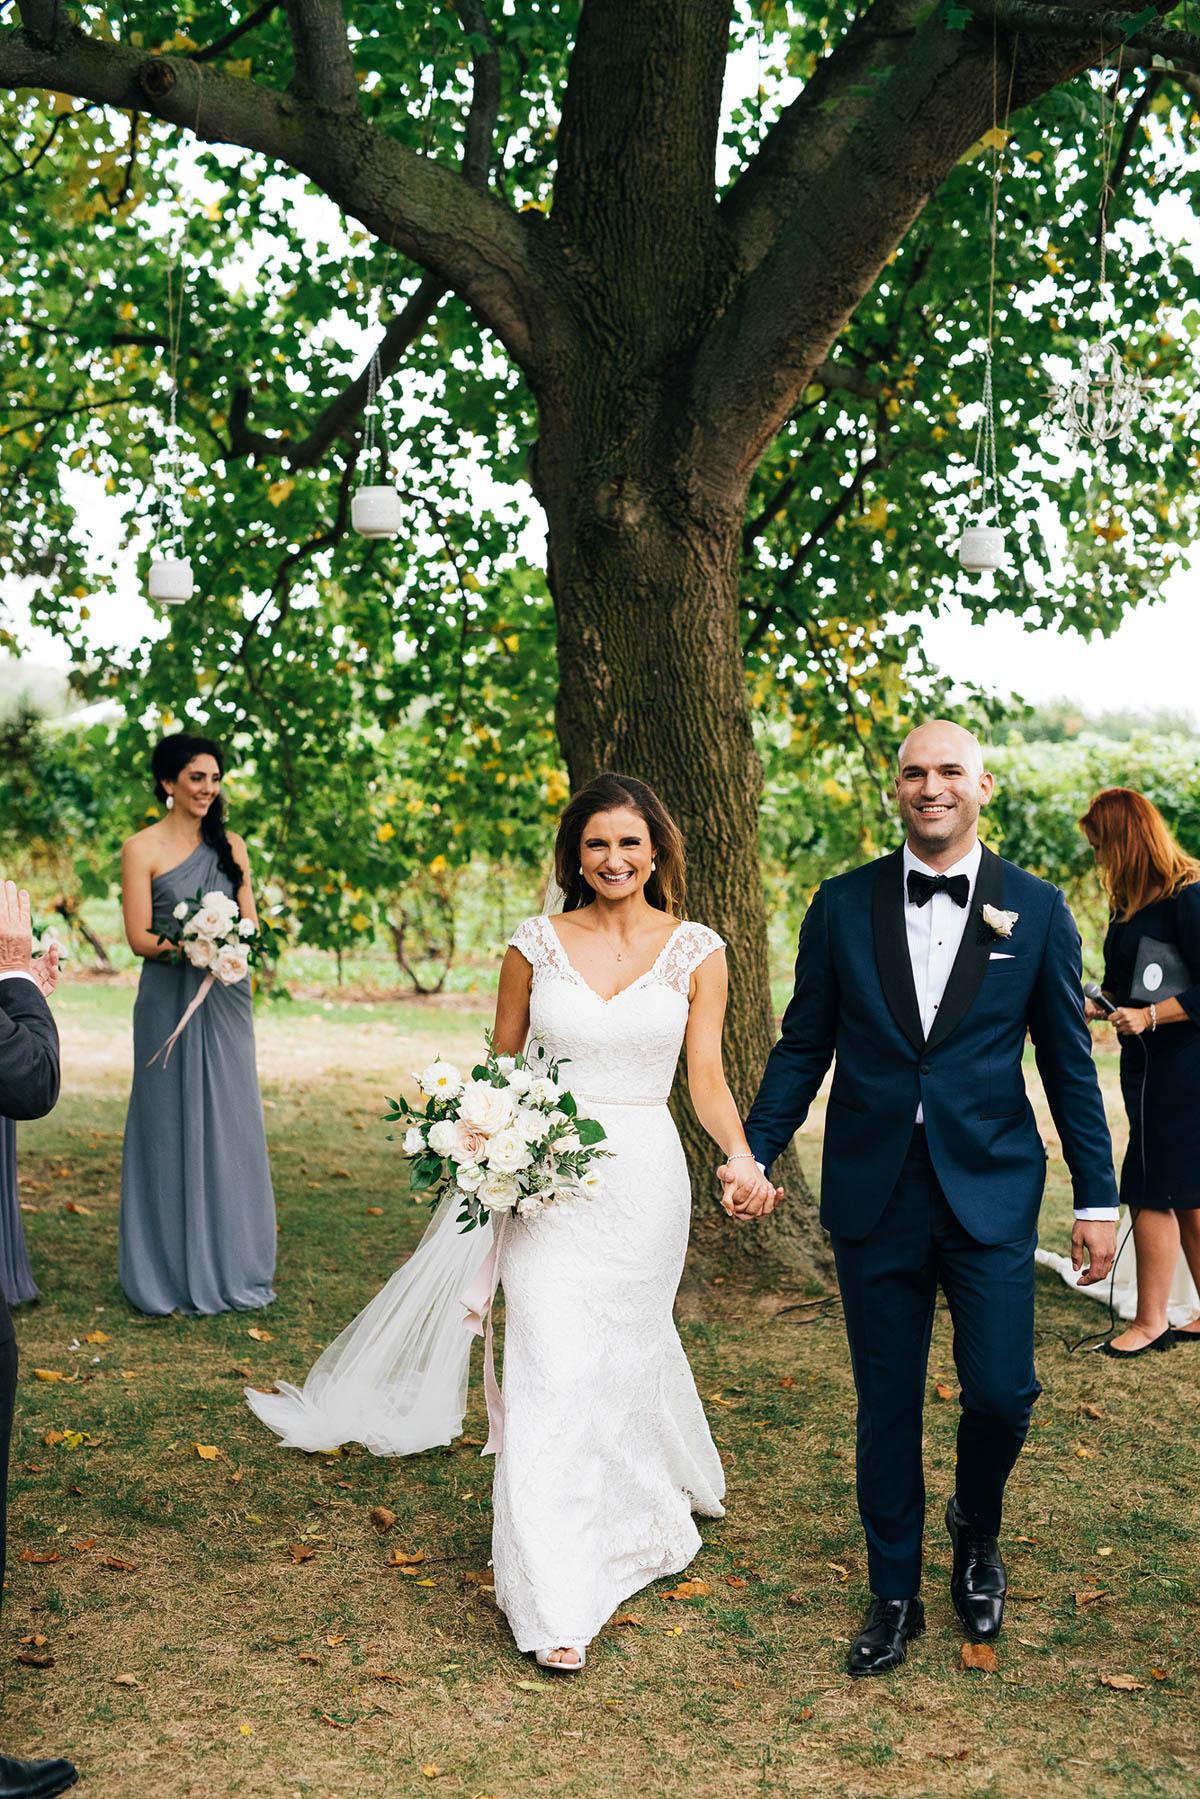 shaw-events-vineyard-bride-swish-list-kurtz-orchards-niagara-on-the-lake-wedding-87.jpg